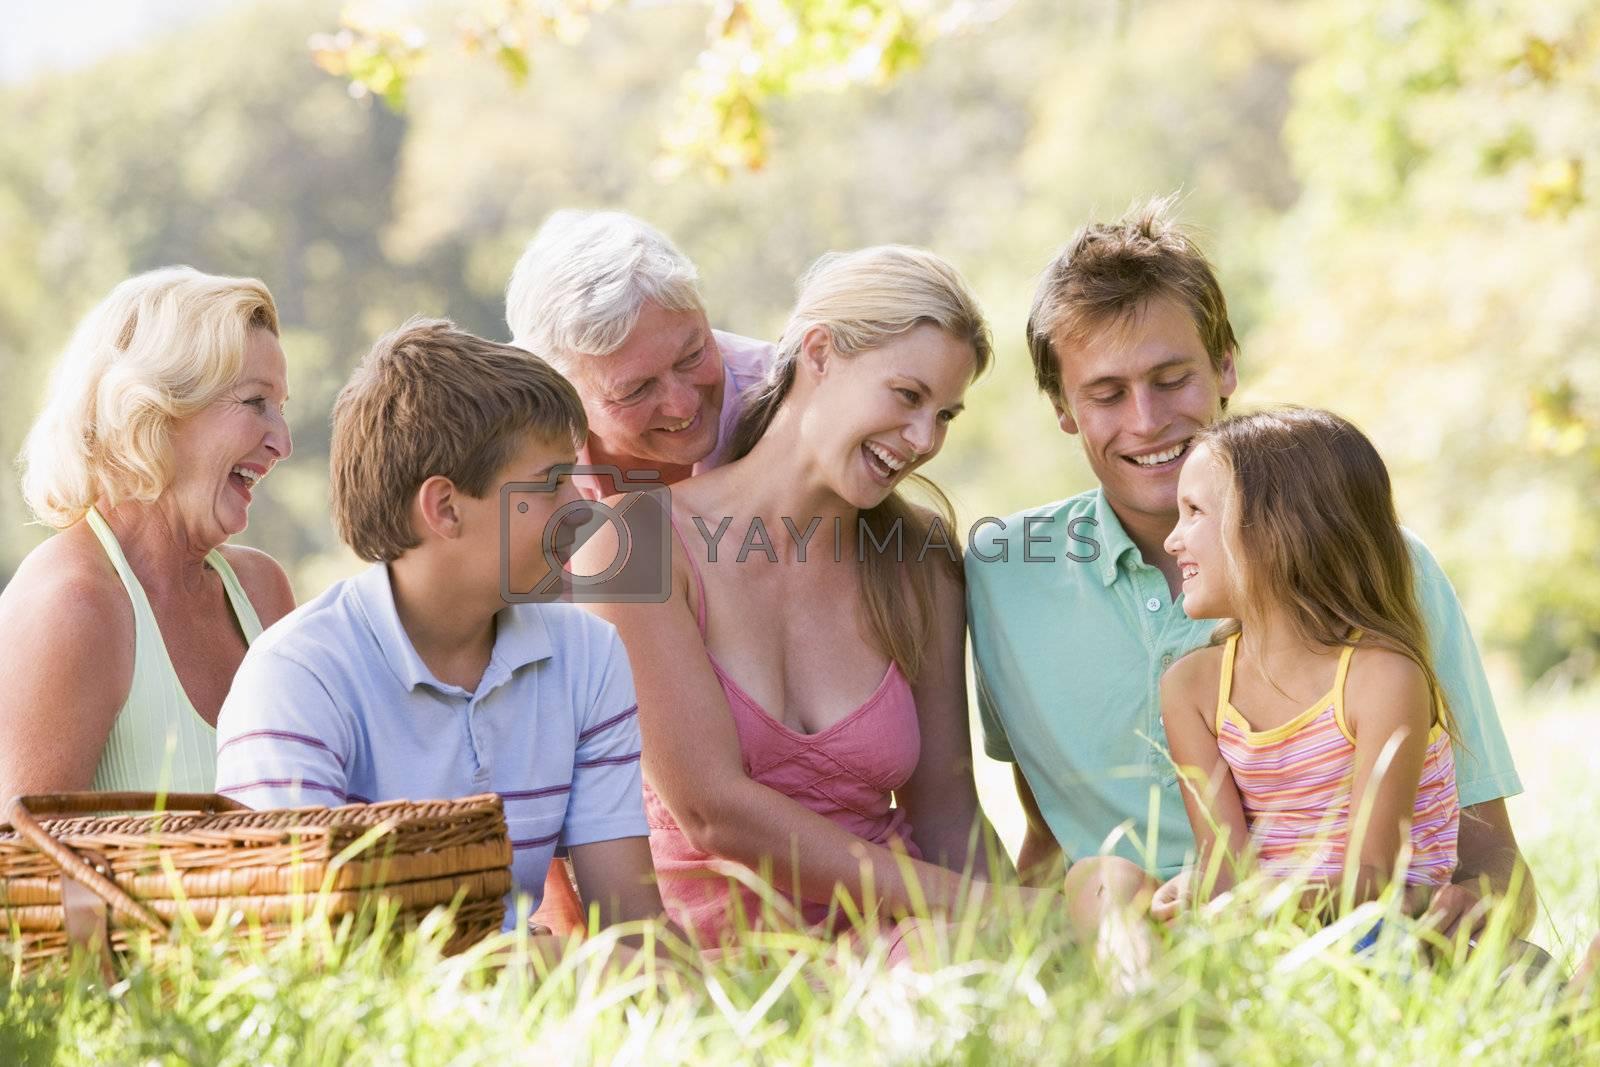 Family at a picnic smiling